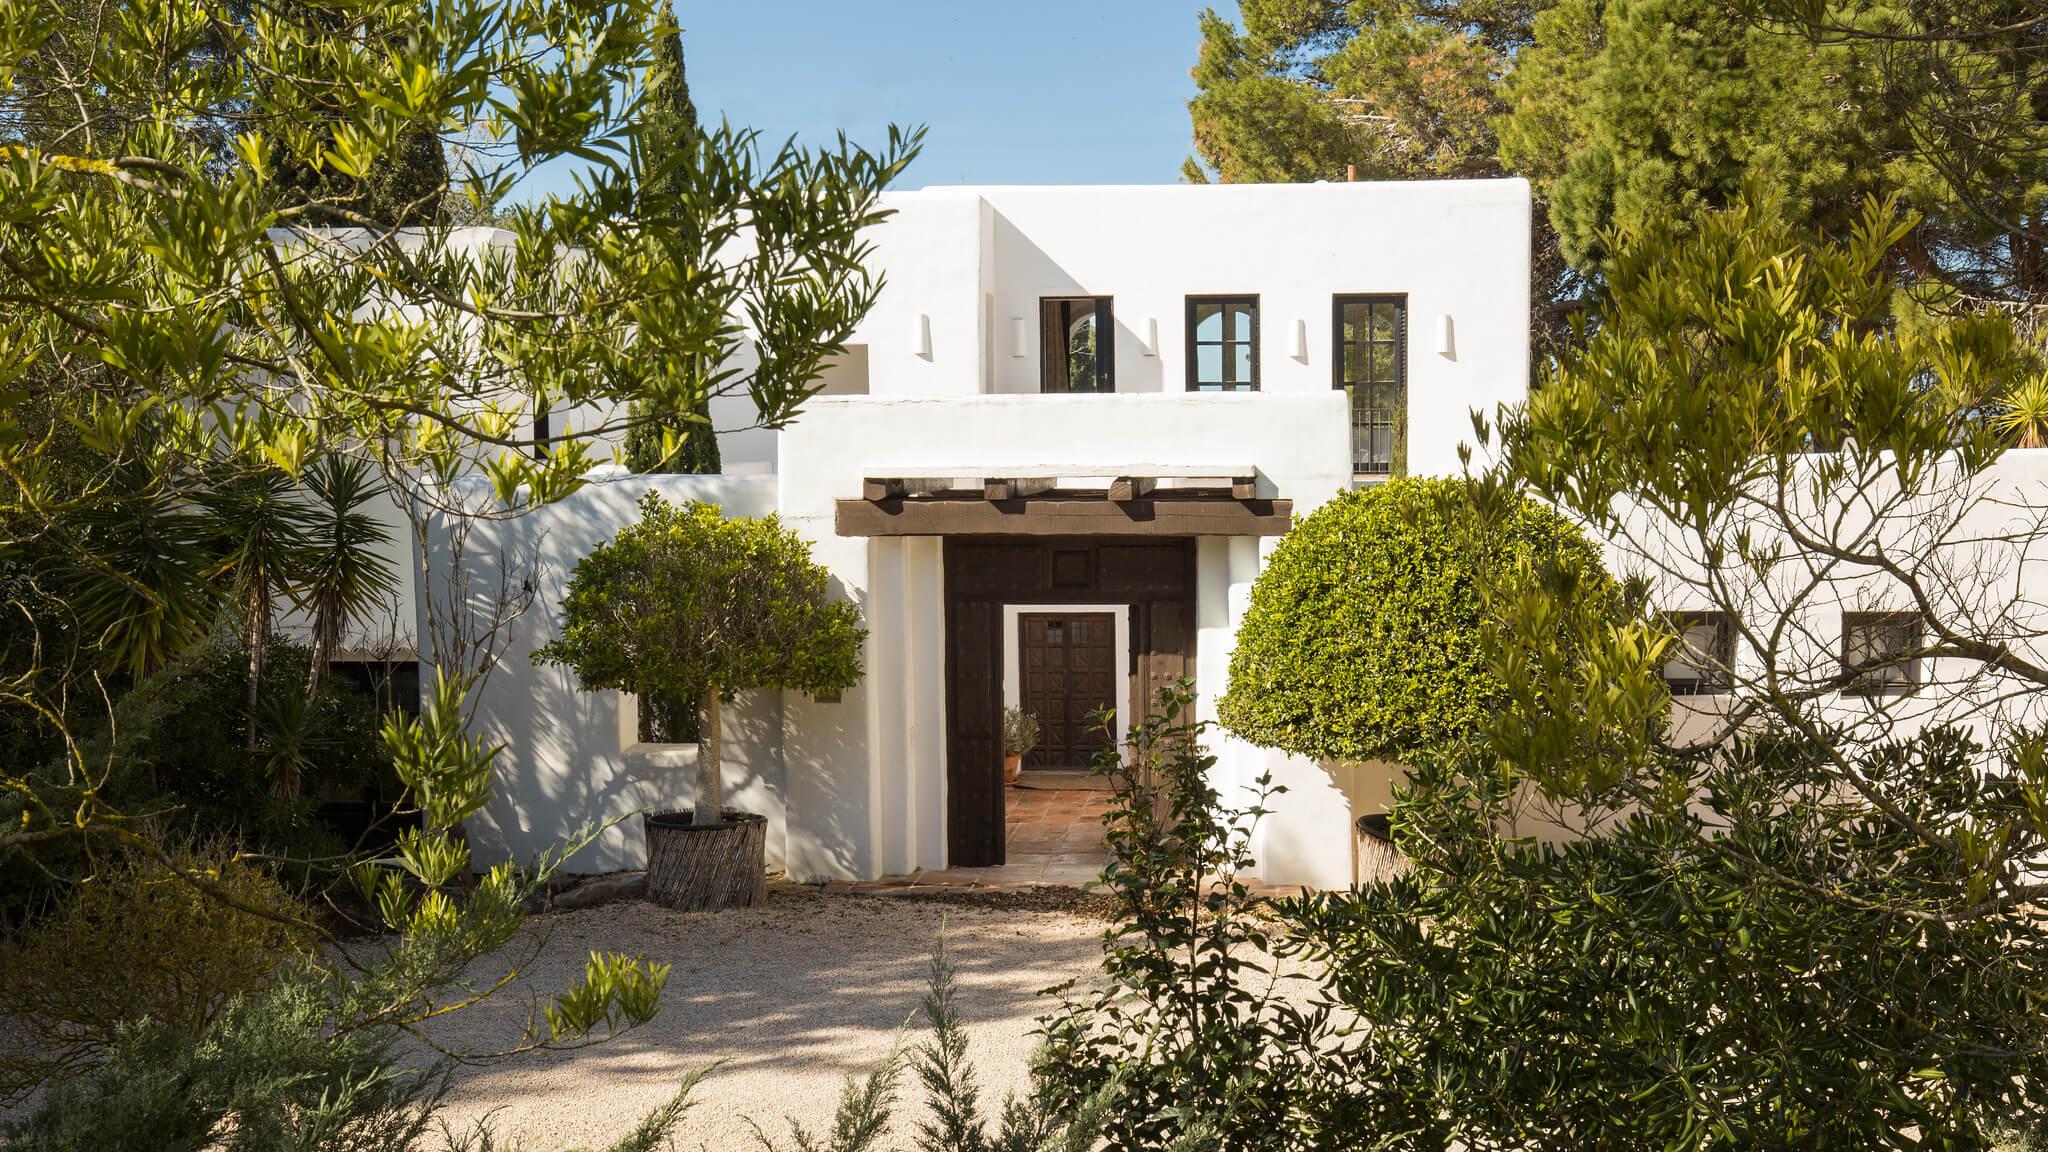 https://www.white-ibiza.com/wp-content/uploads/2020/05/white-ibiza-villas-can-amelida-exterior-house.jpg